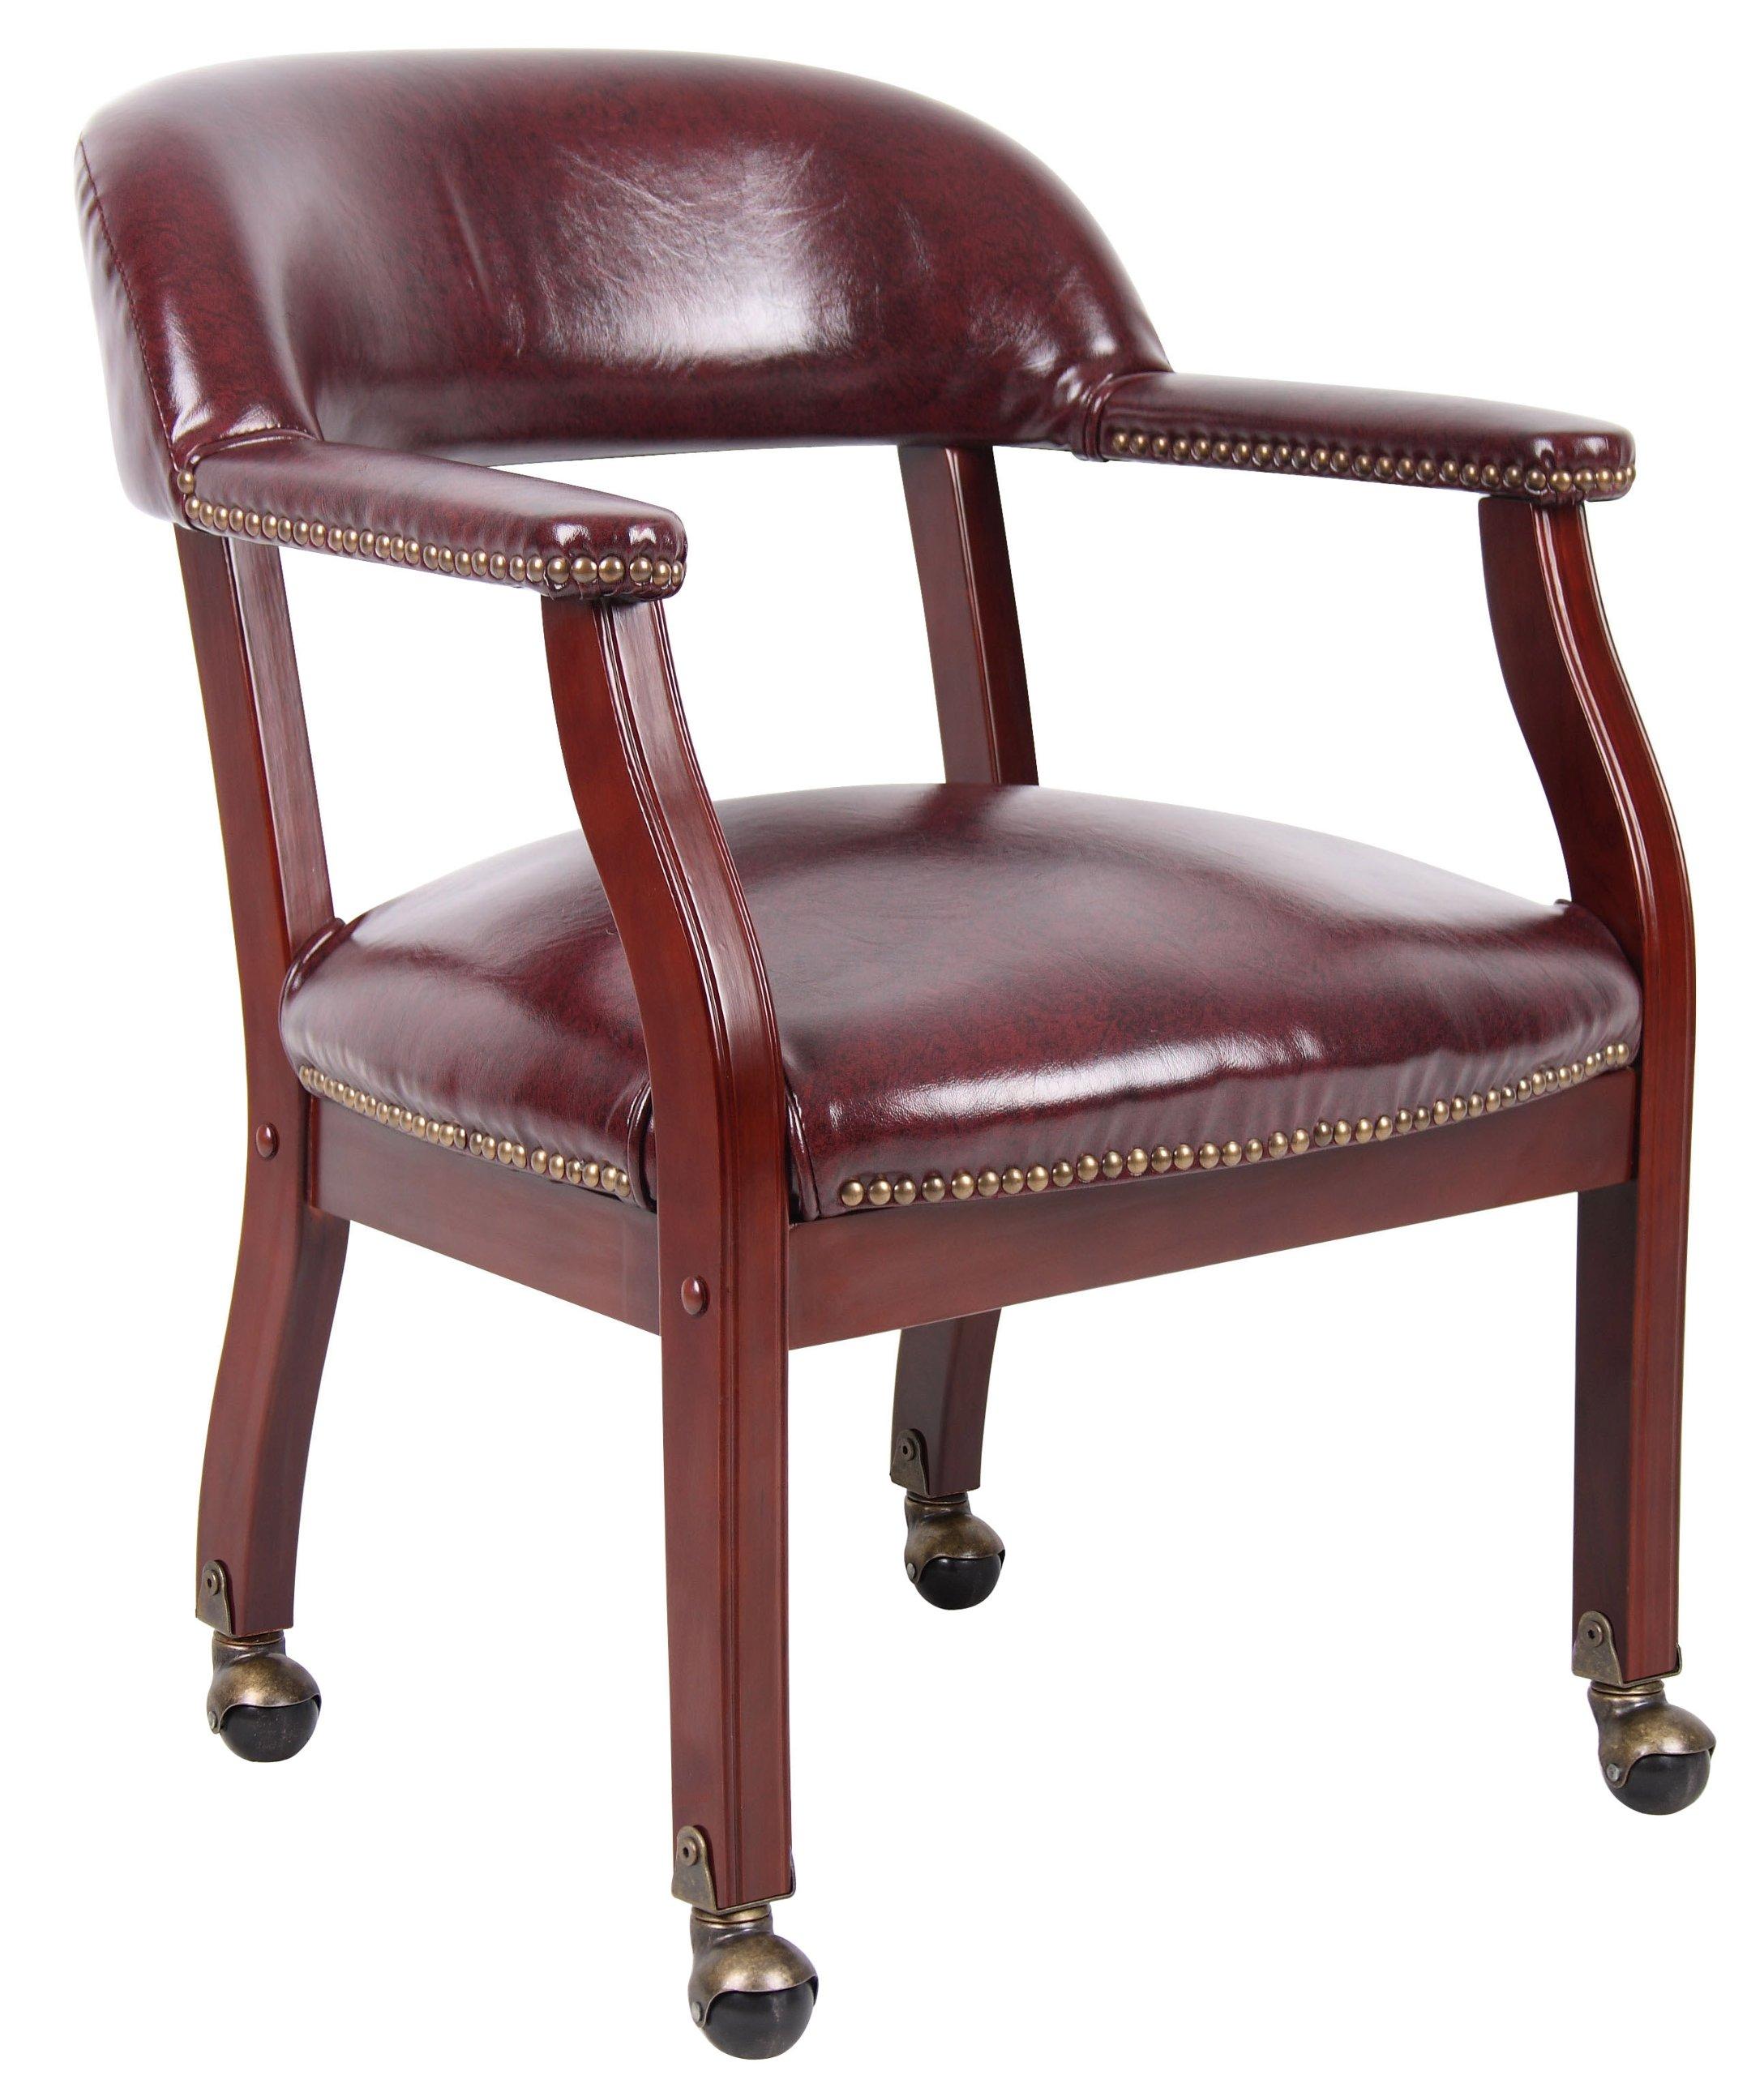 Boss Captain's Chair In Burgundy Vinyl W/ Casters